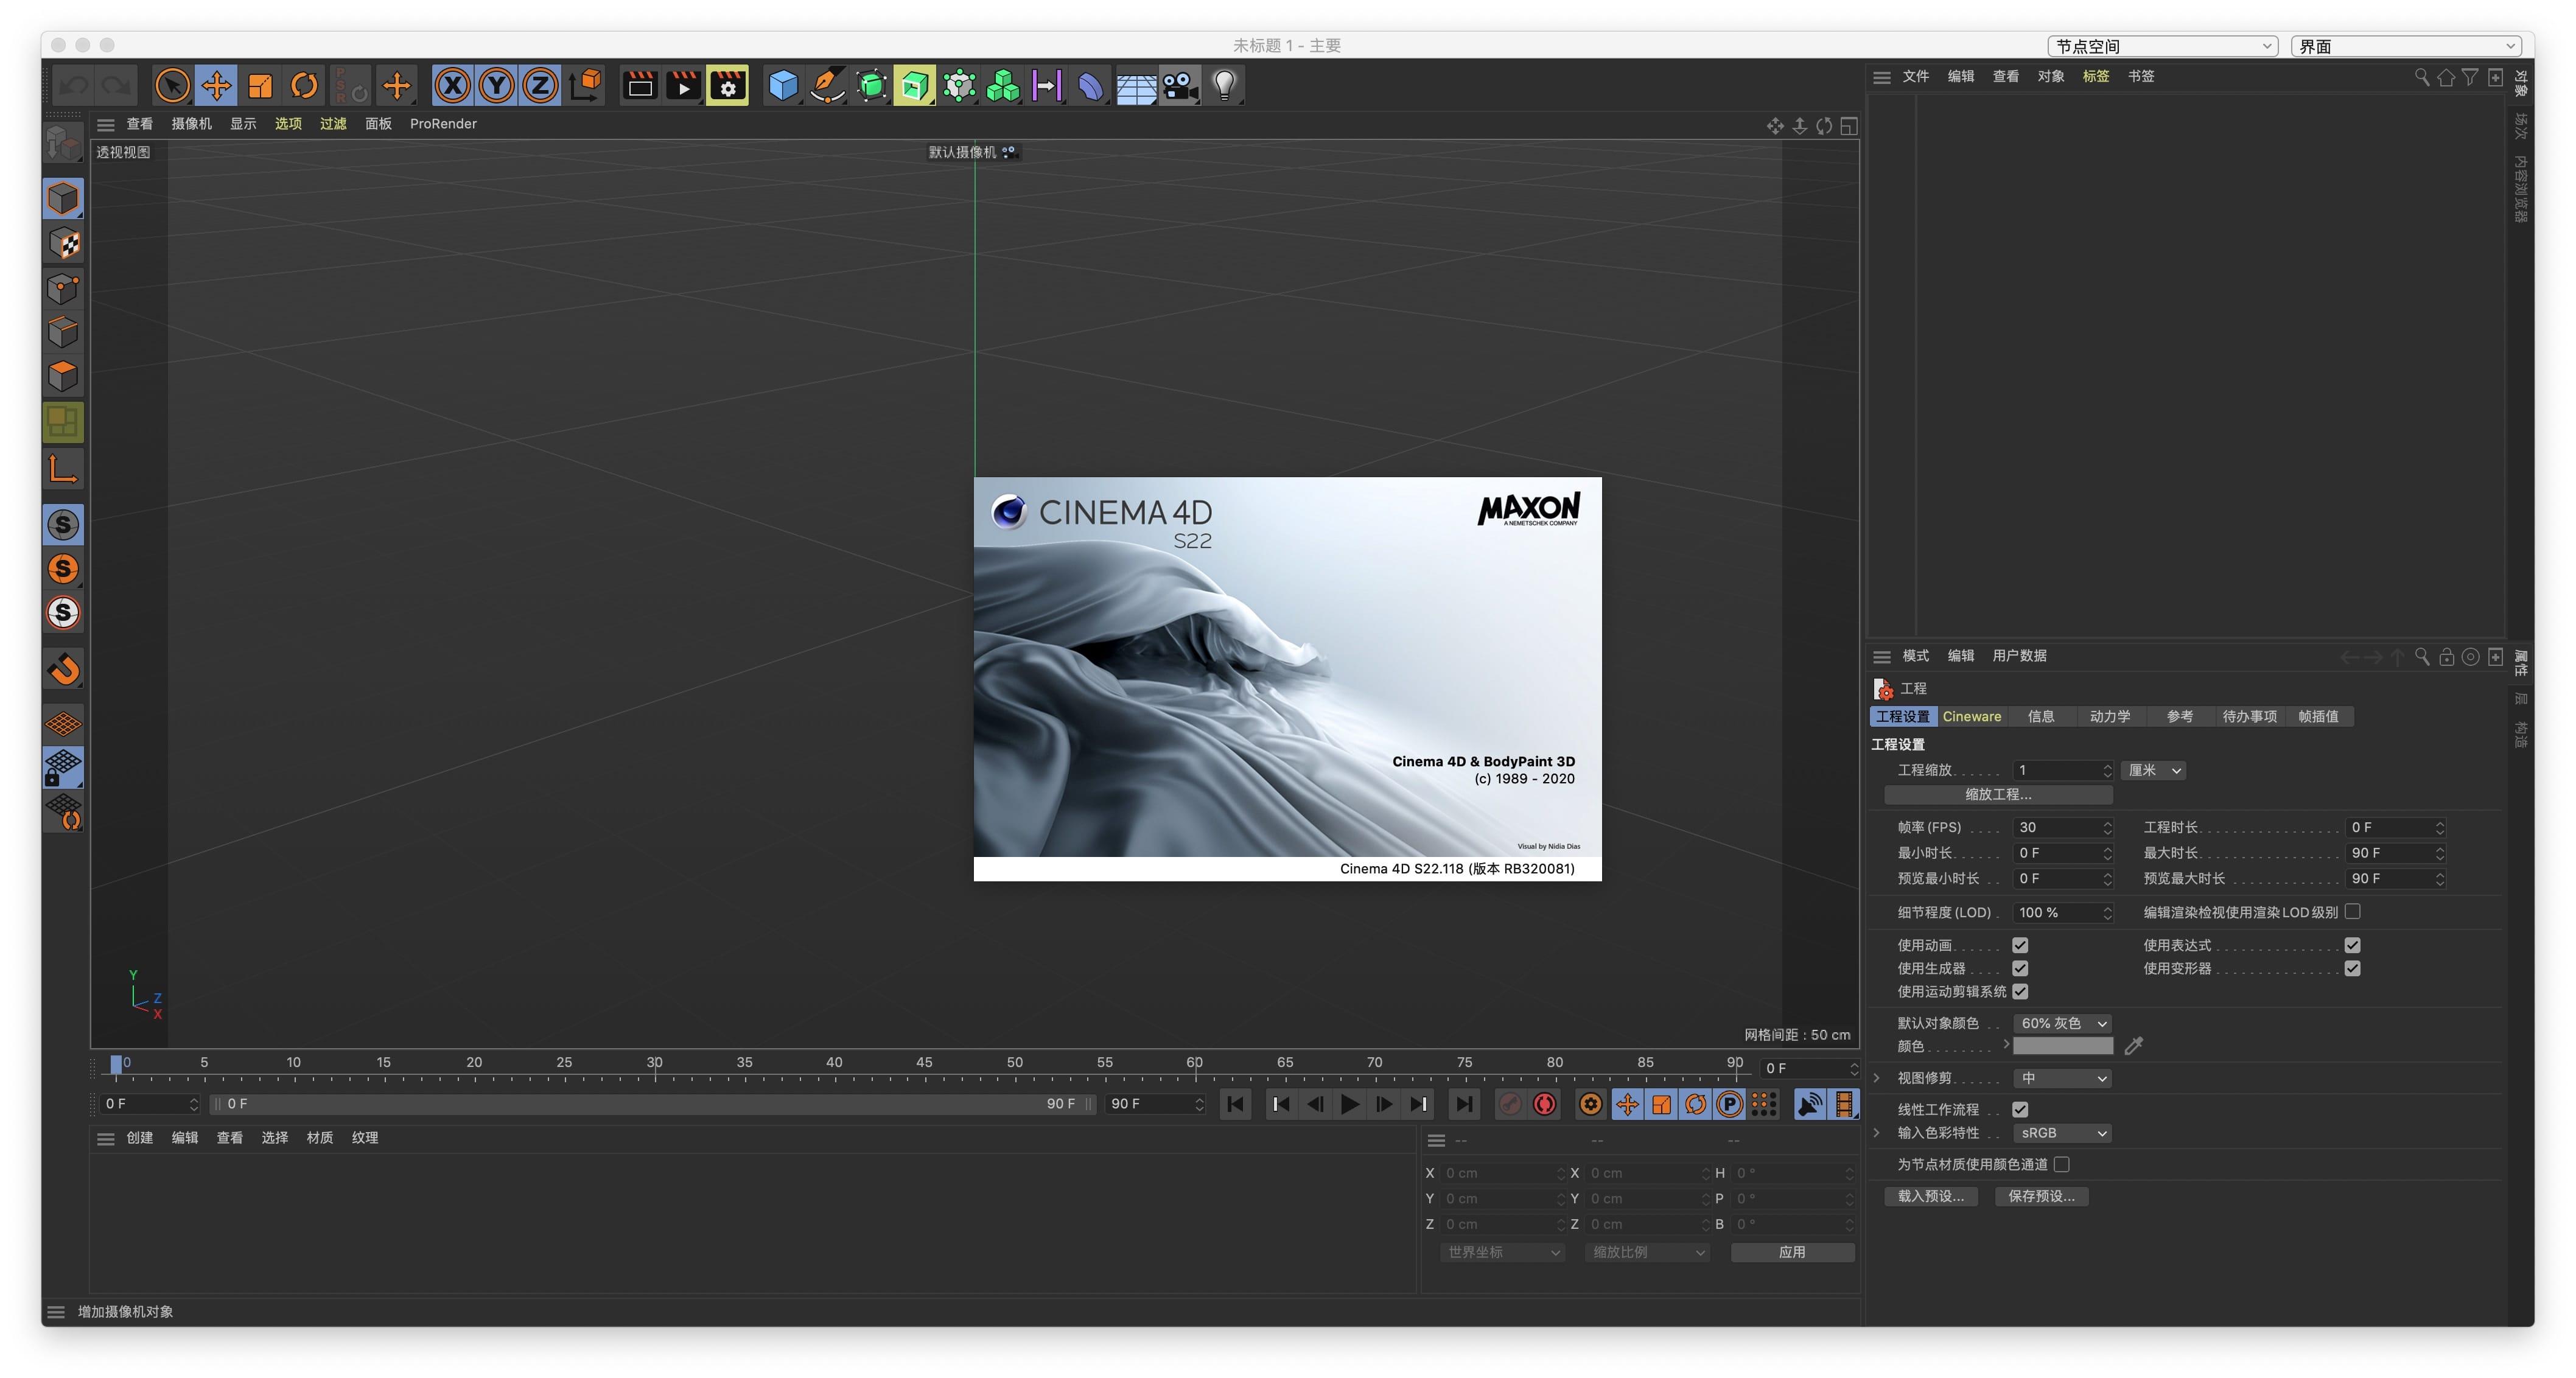 Maxon Cinema 4D Studio(C4D) R23.008  汉化版  强大的3D动画设计建模工具  第4张